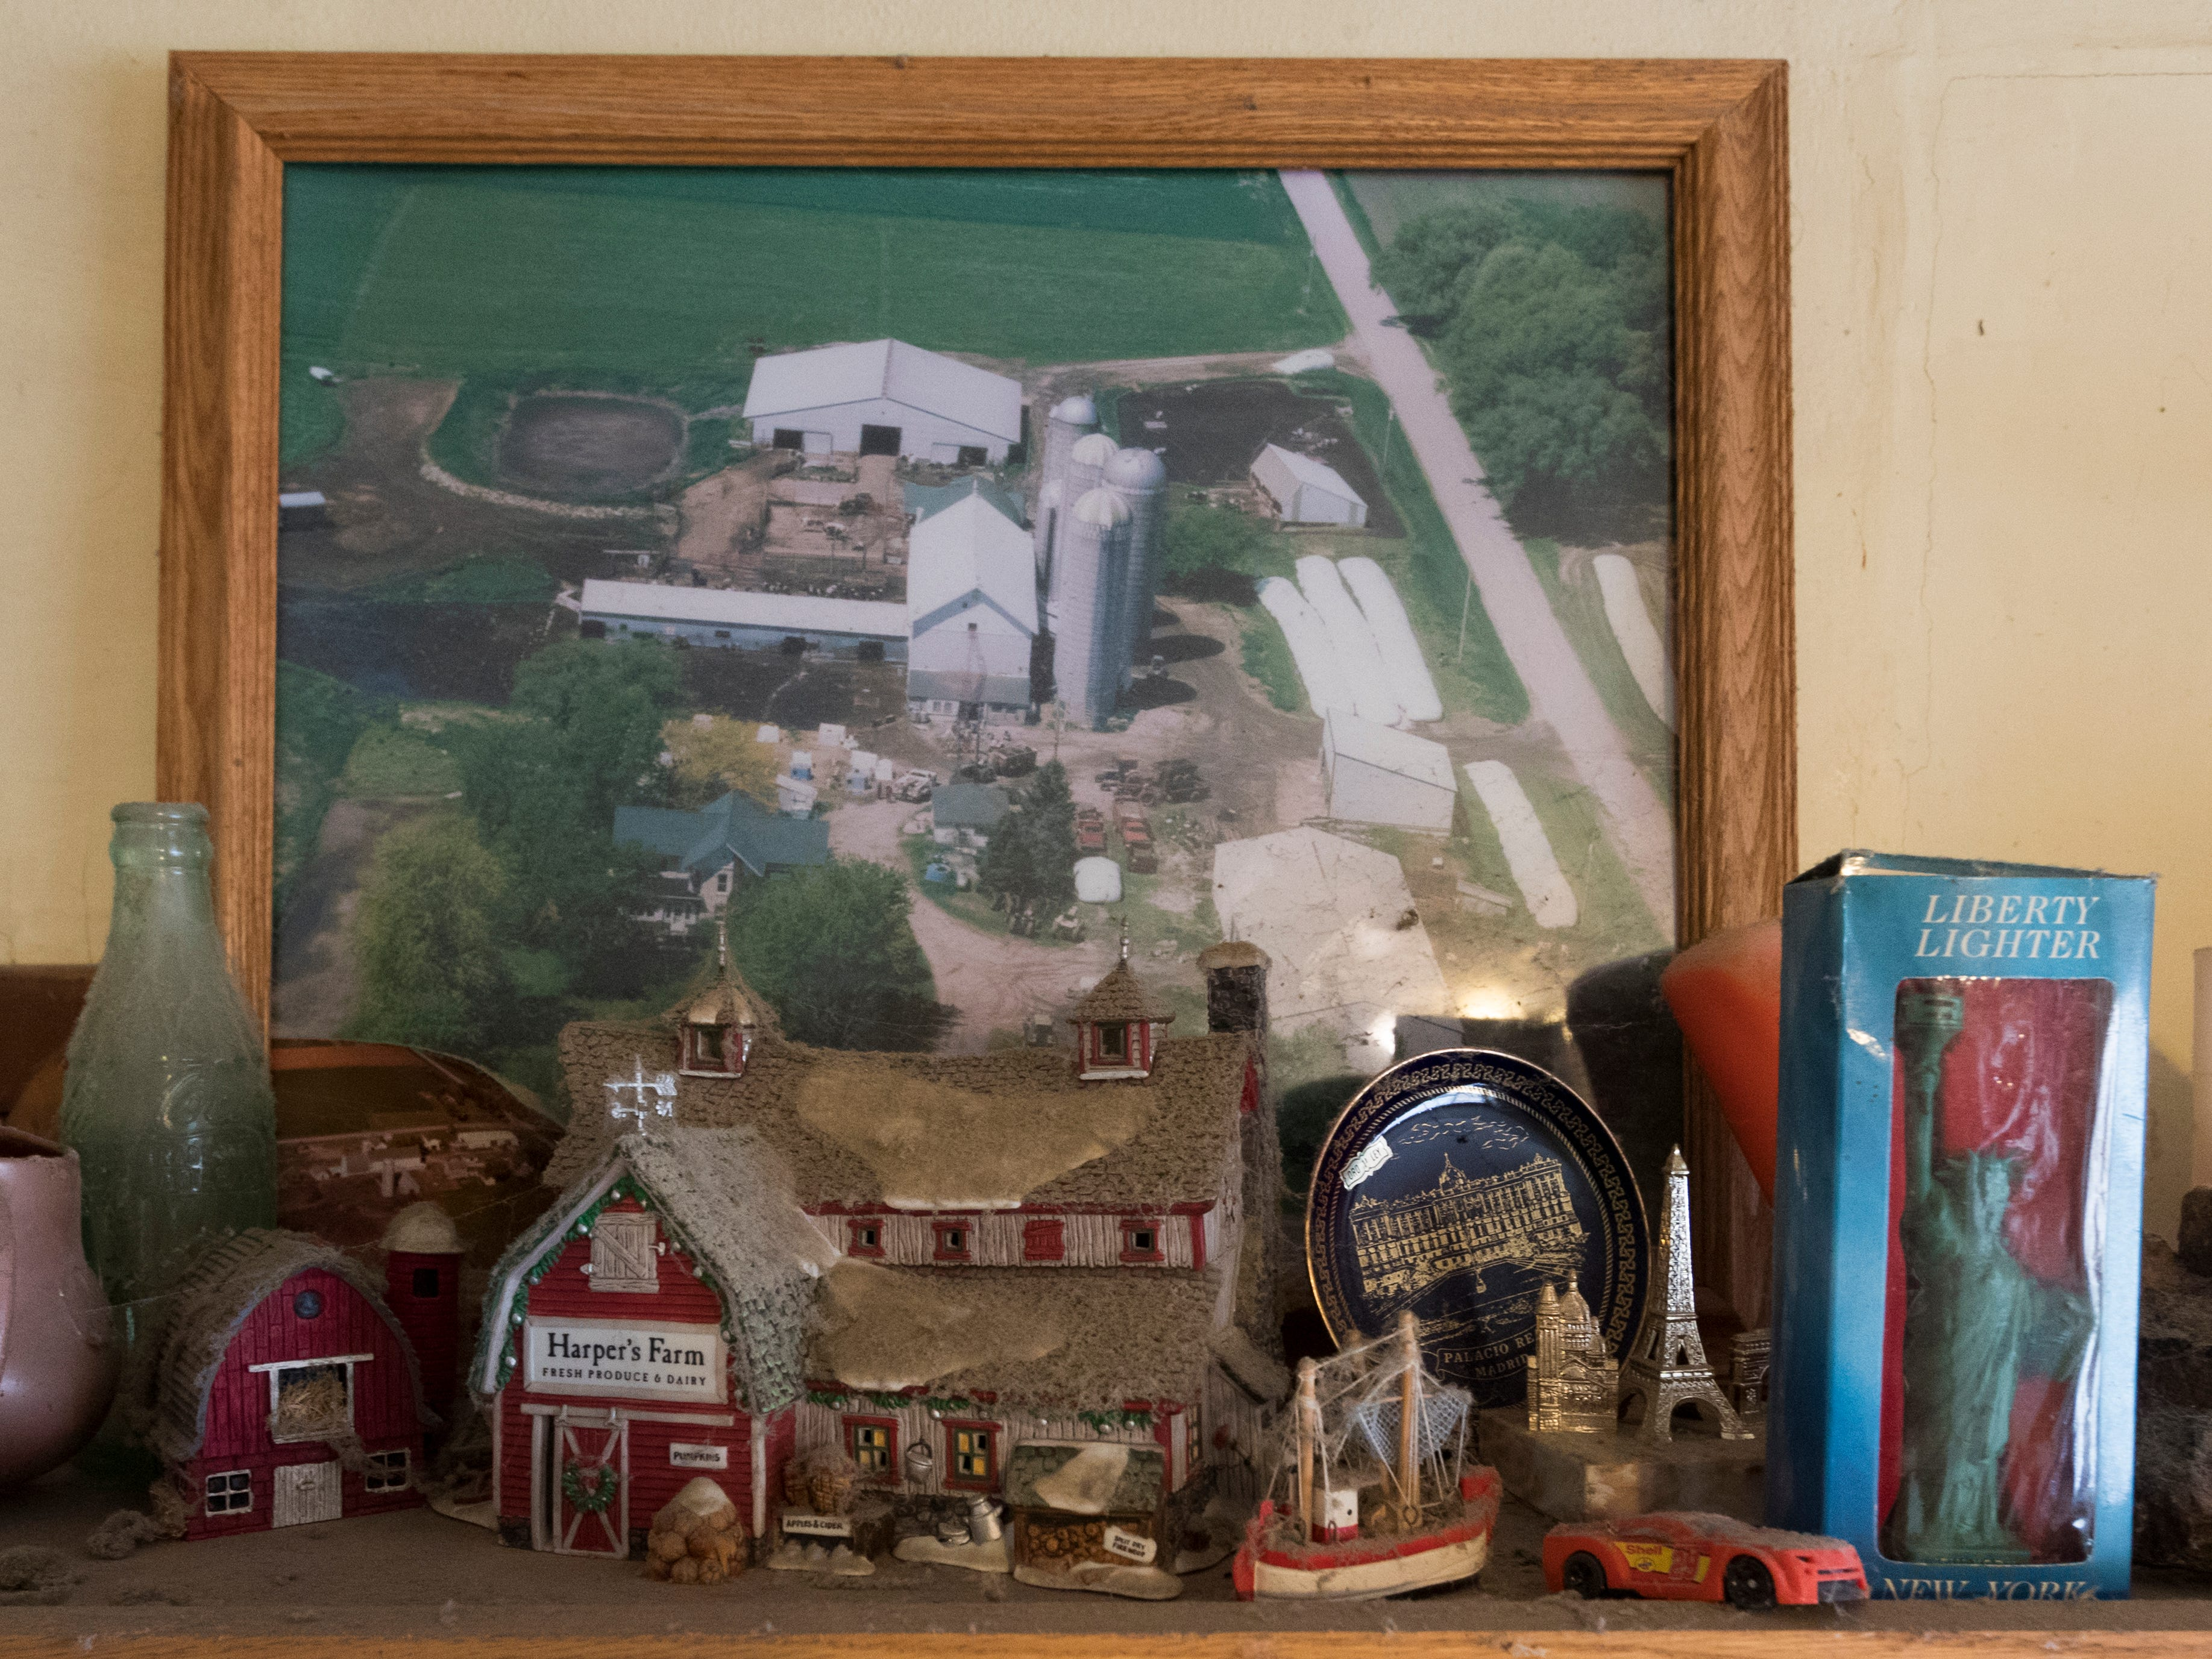 Mementos surround a photo of the Mess family farm in the kitchen.